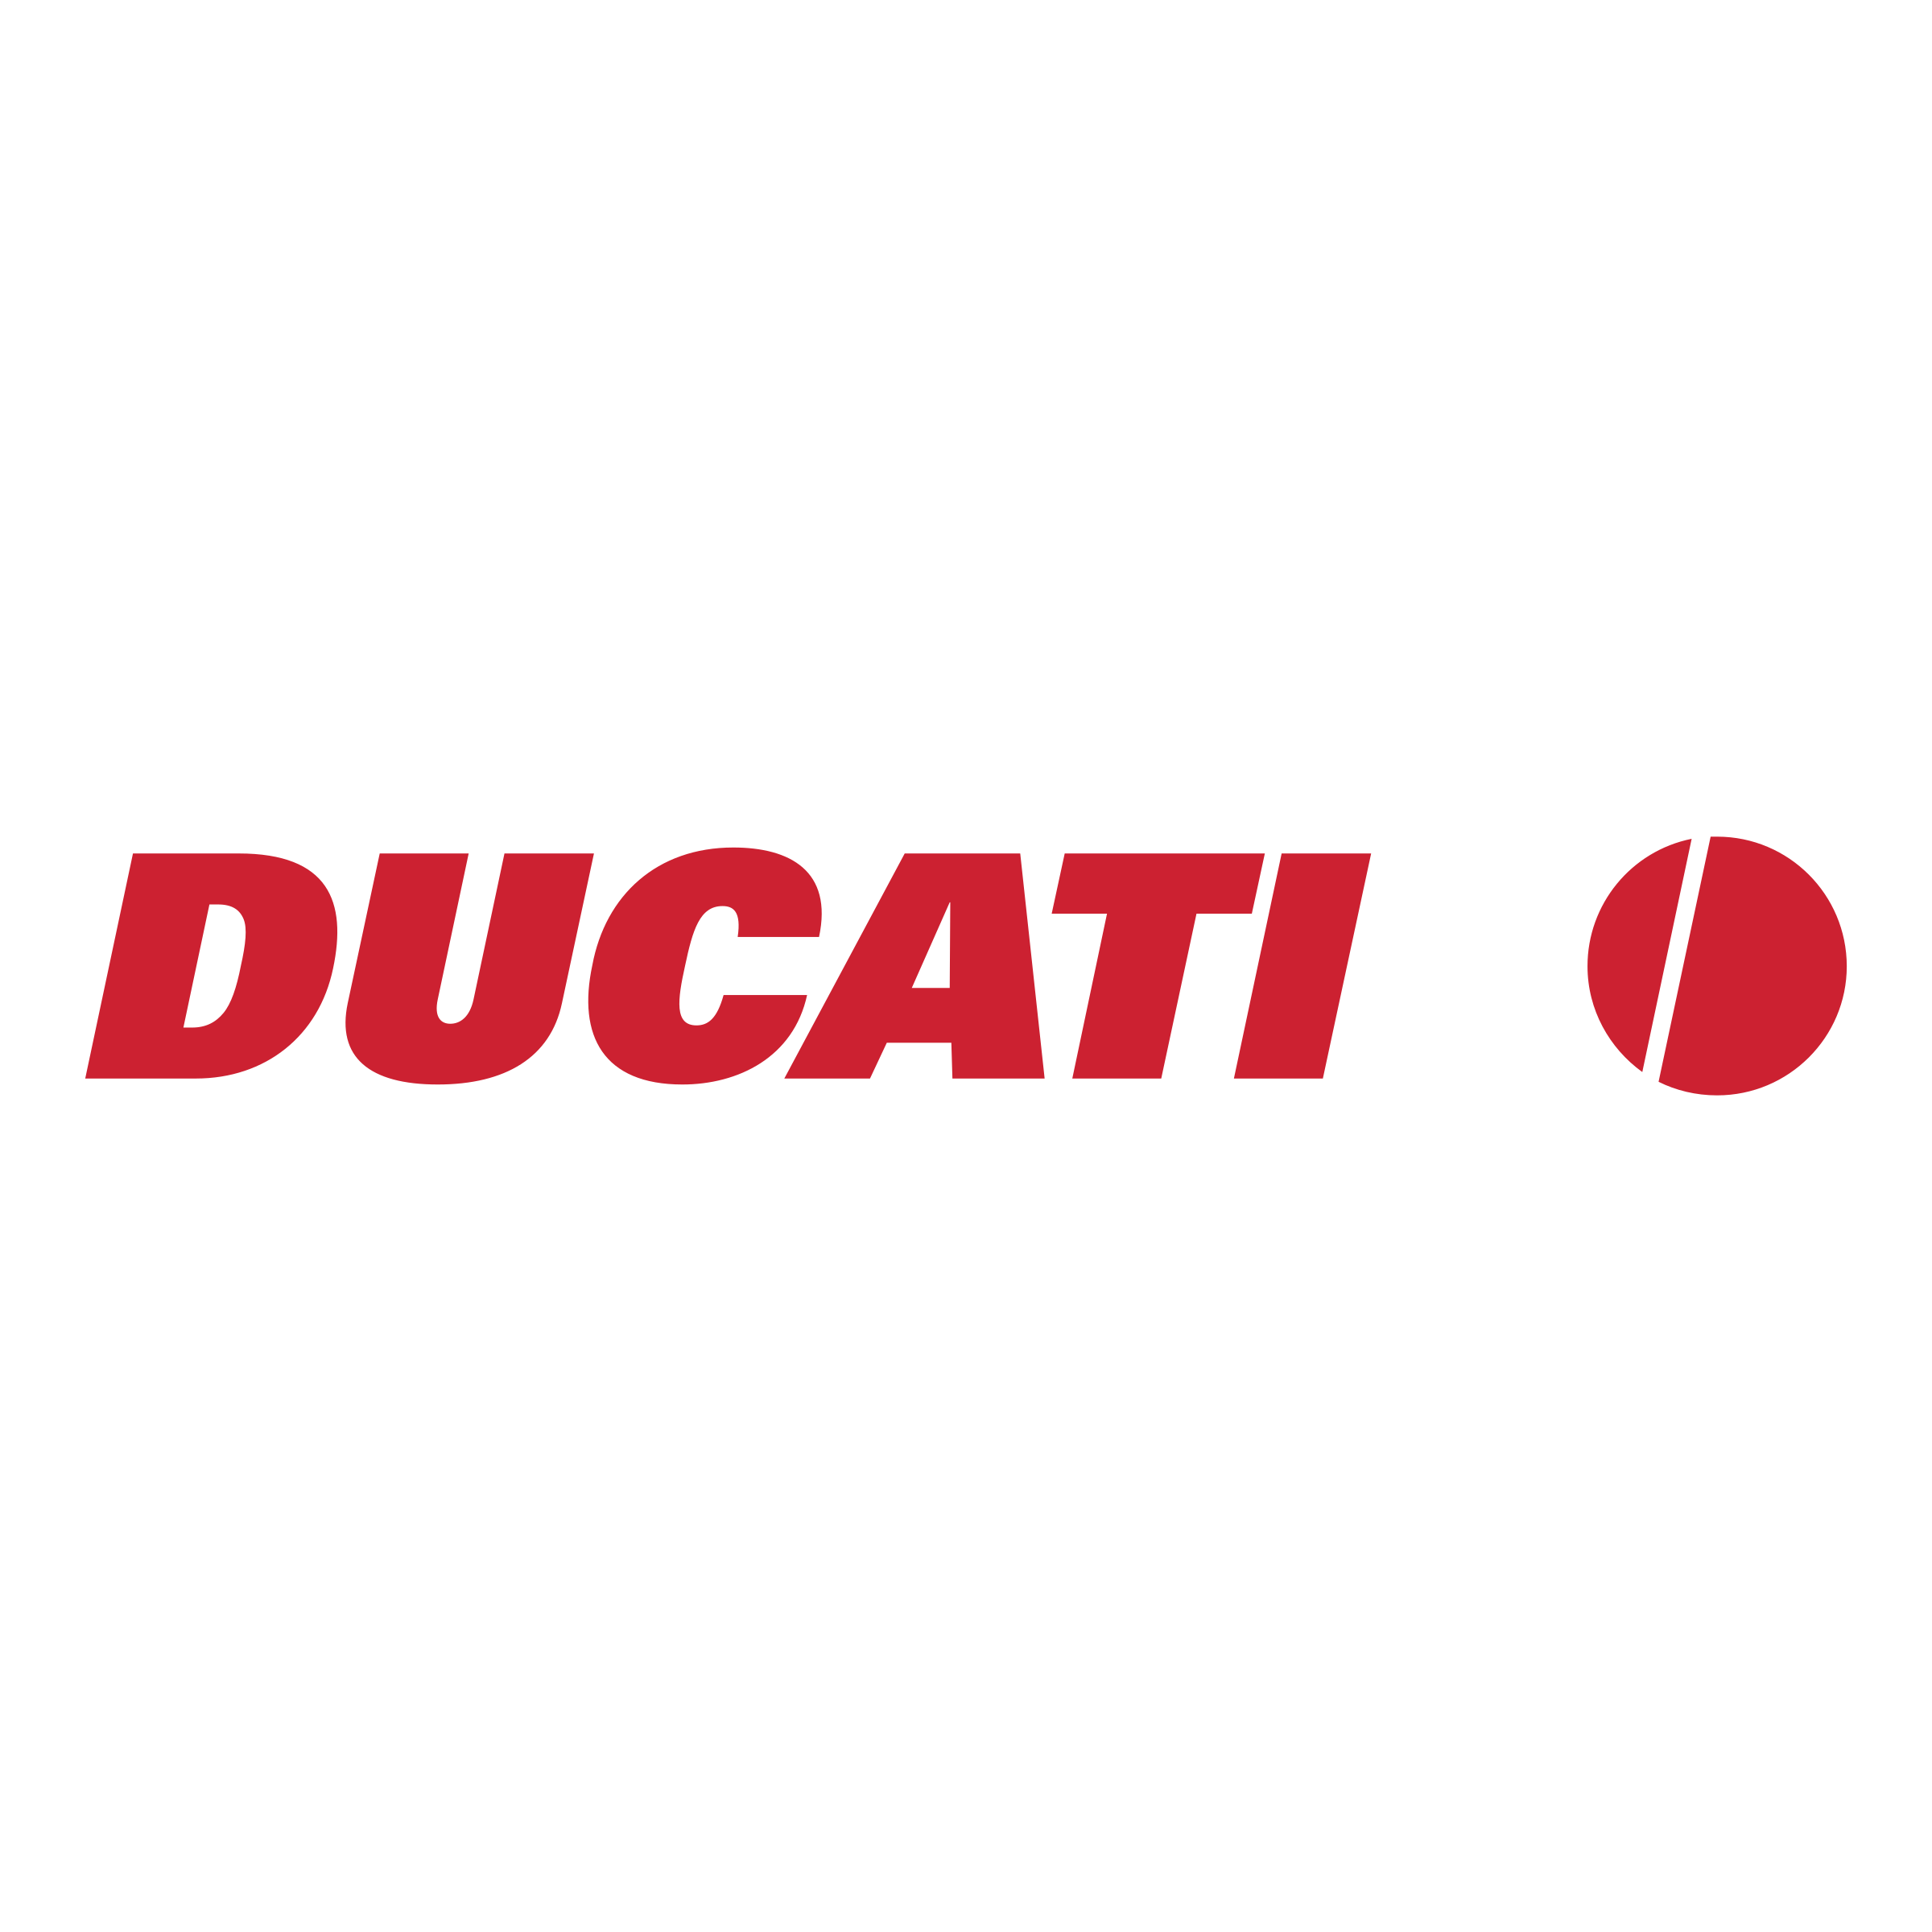 Ducati Logo PNG Transparent & SVG Vector - Freebie Supply